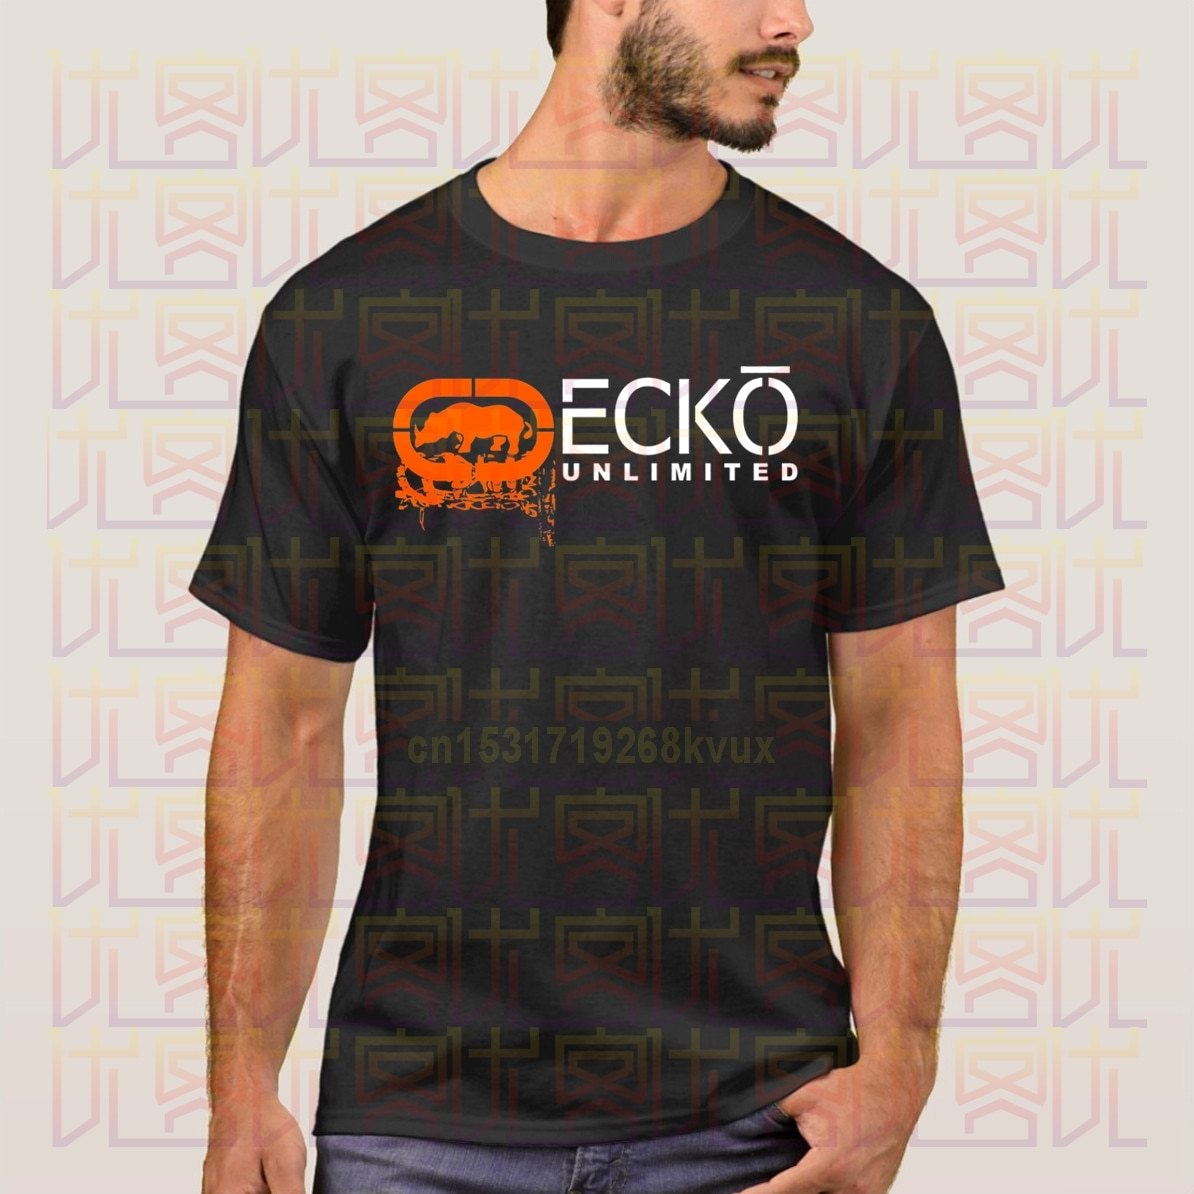 Ecko-unltd Unlimited Streetwear camiseta 2020 nuevo verano hombres de manga corta Popular camiseta Tops increíble Unisex